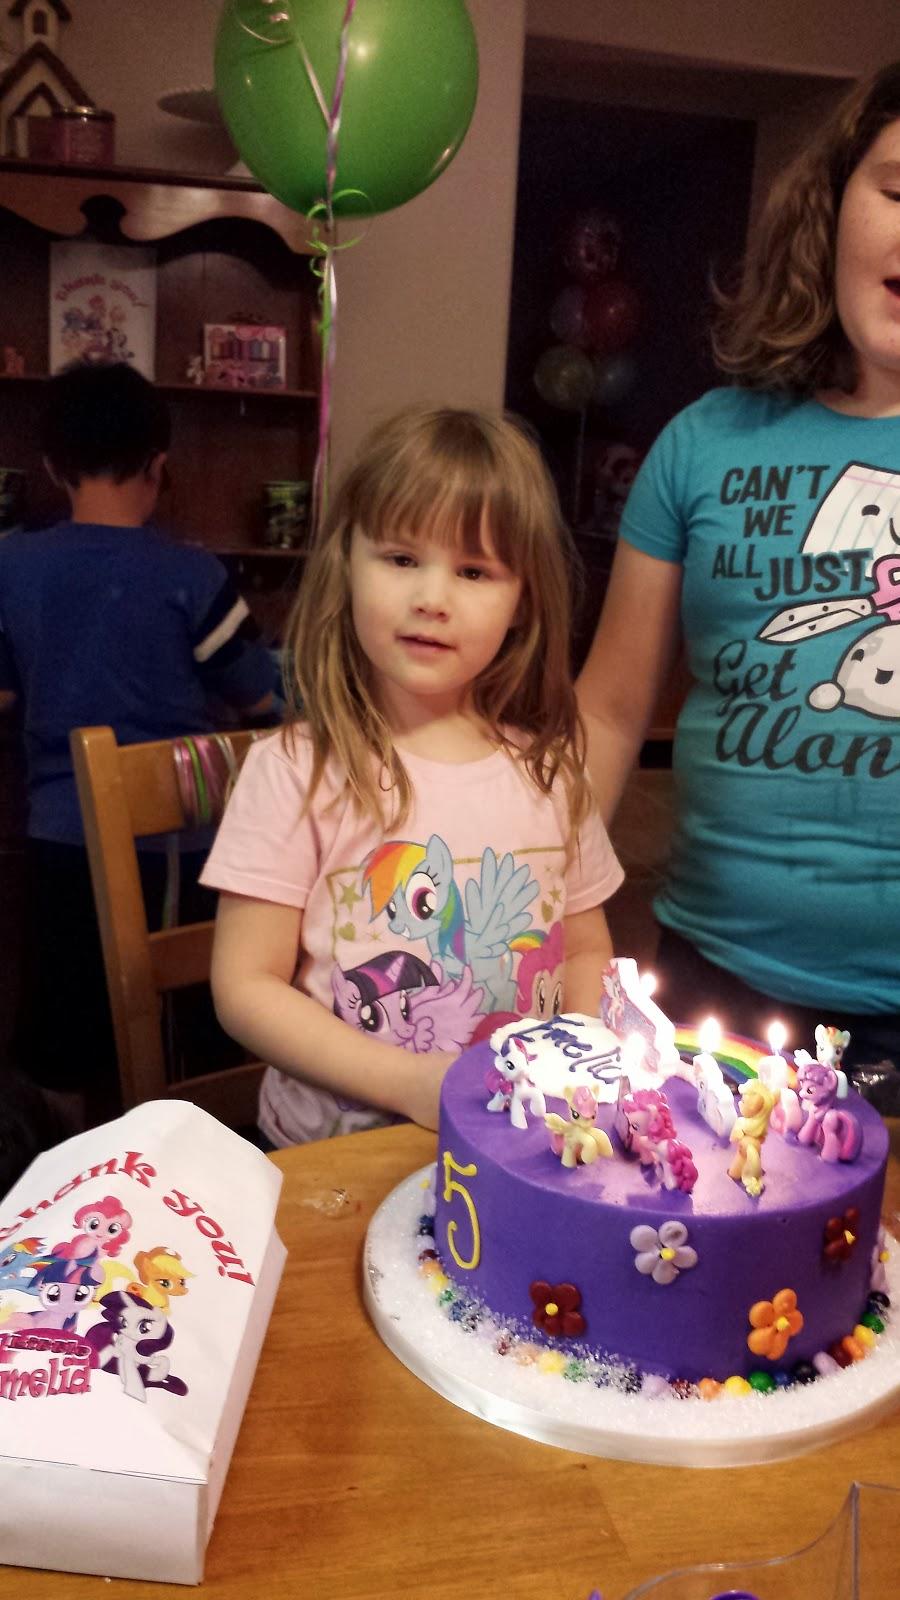 City Kitty S Blog Spot Diy My Little Pony Party For My